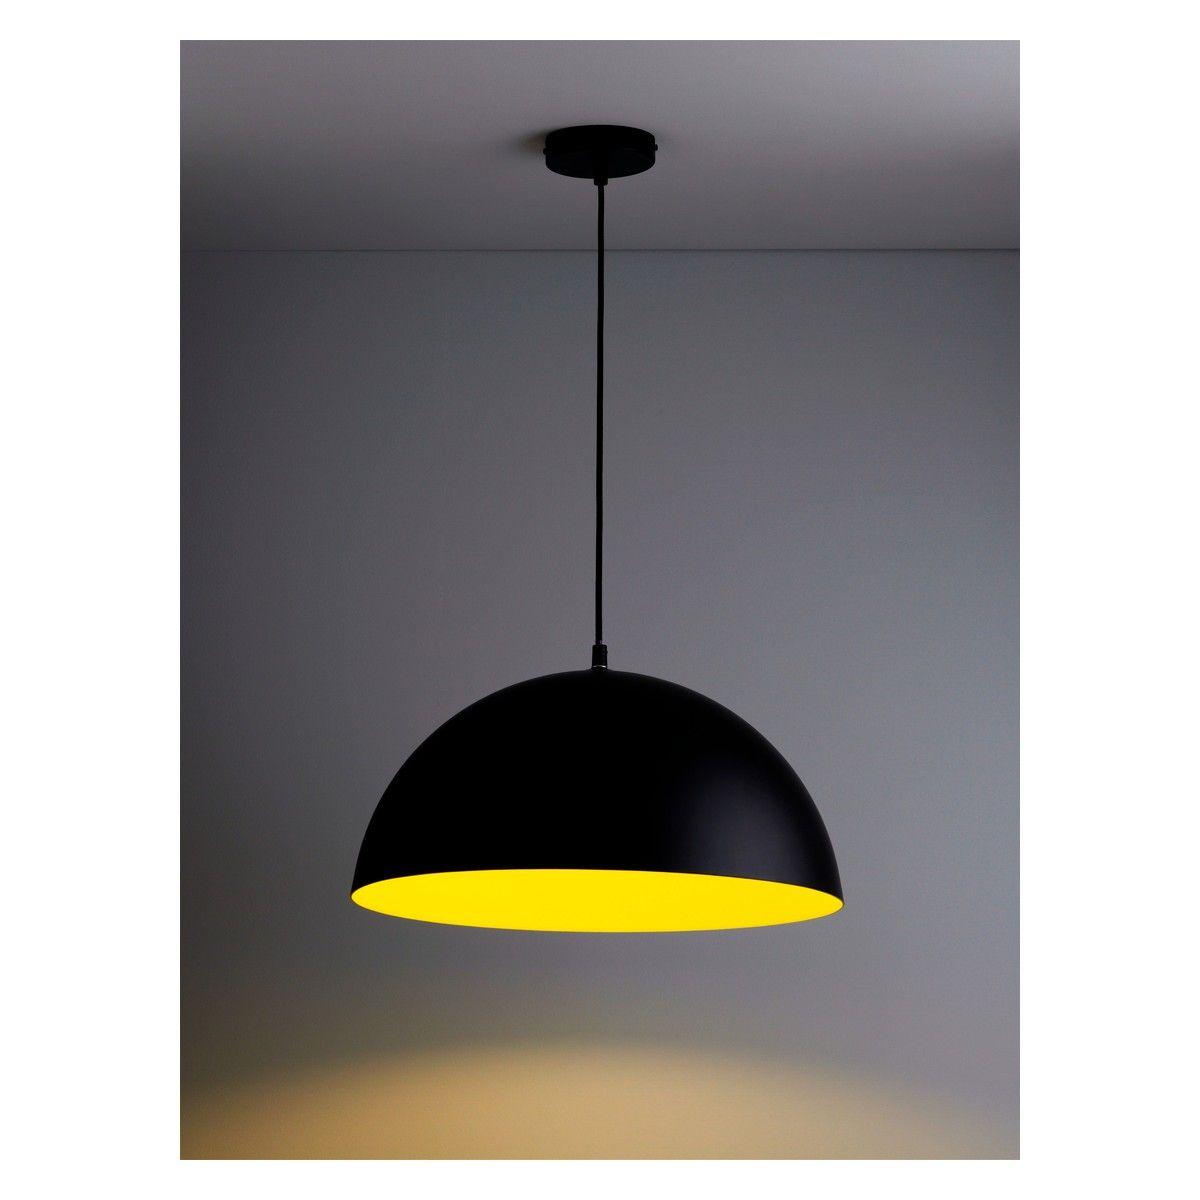 samuel metal ceiling light black and yellow buy now at habitat uk